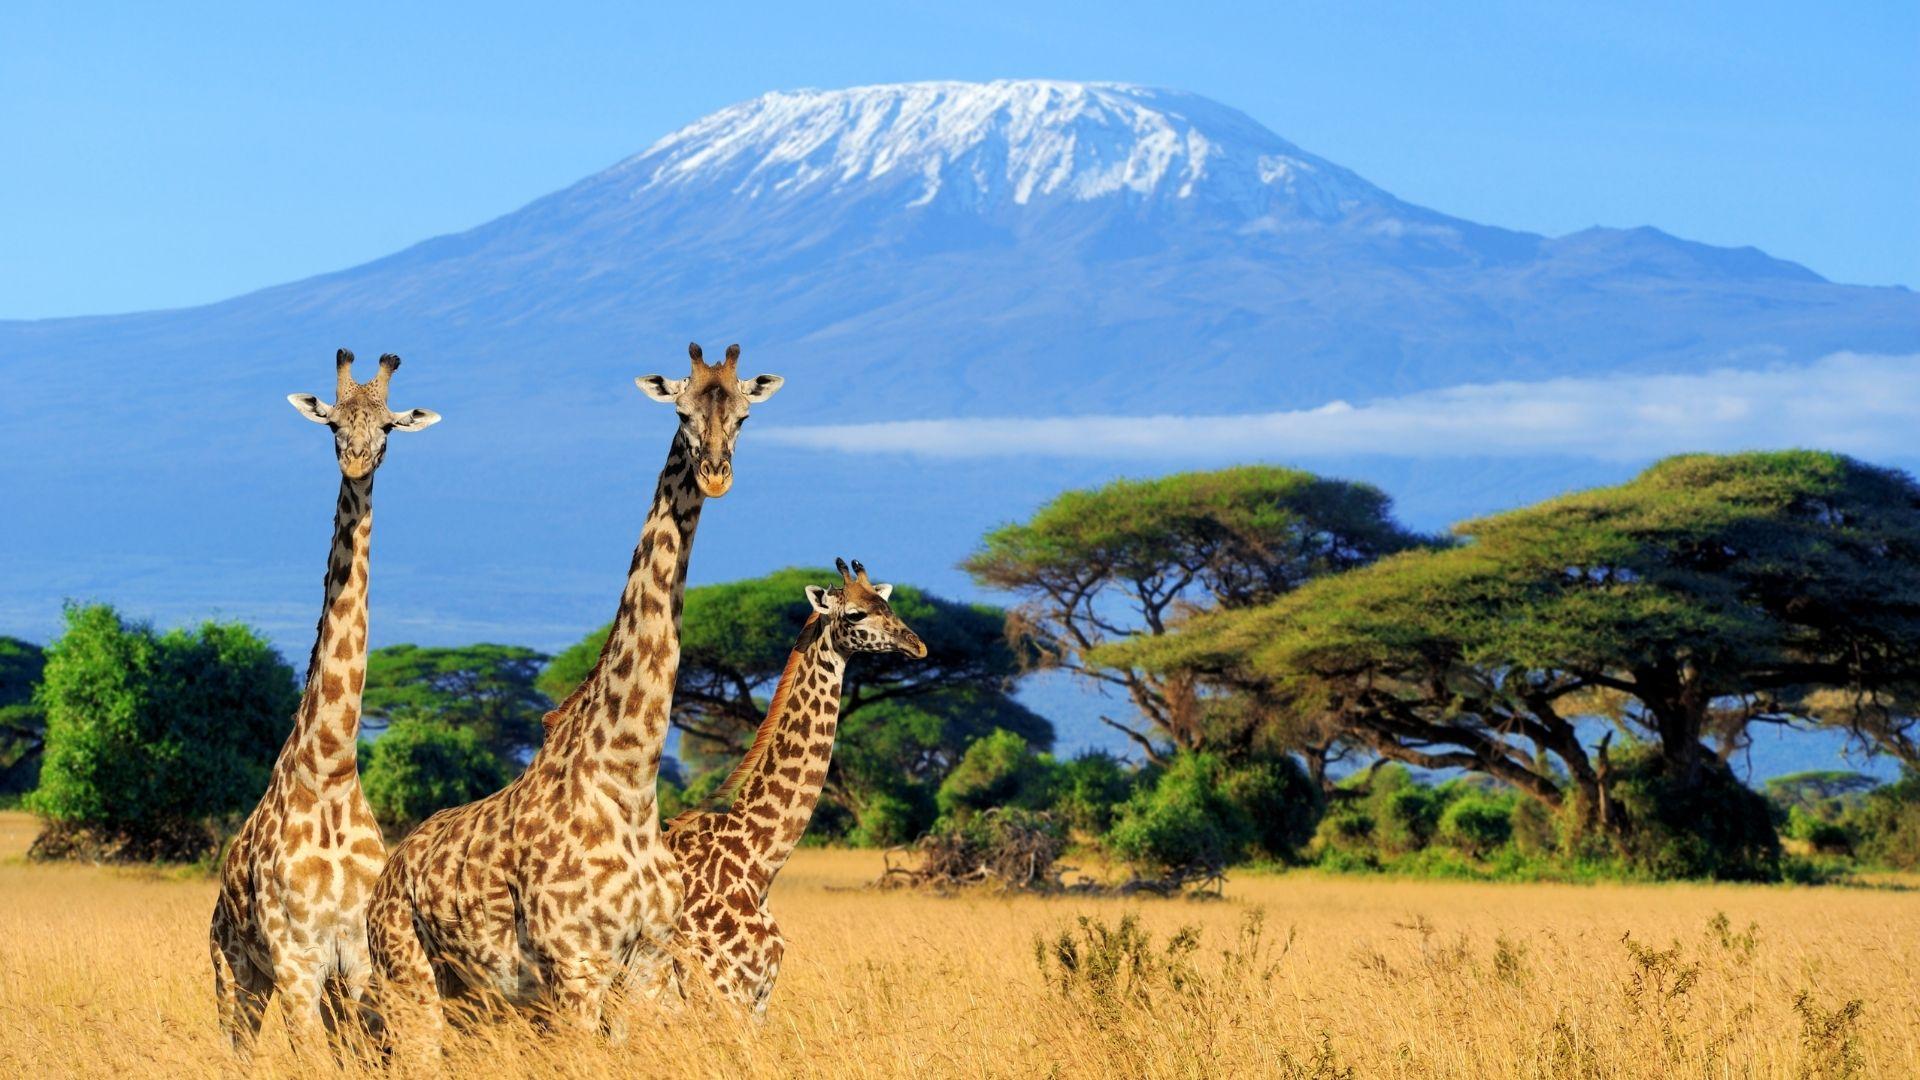 Episode 556 Do You Know - Giraffes